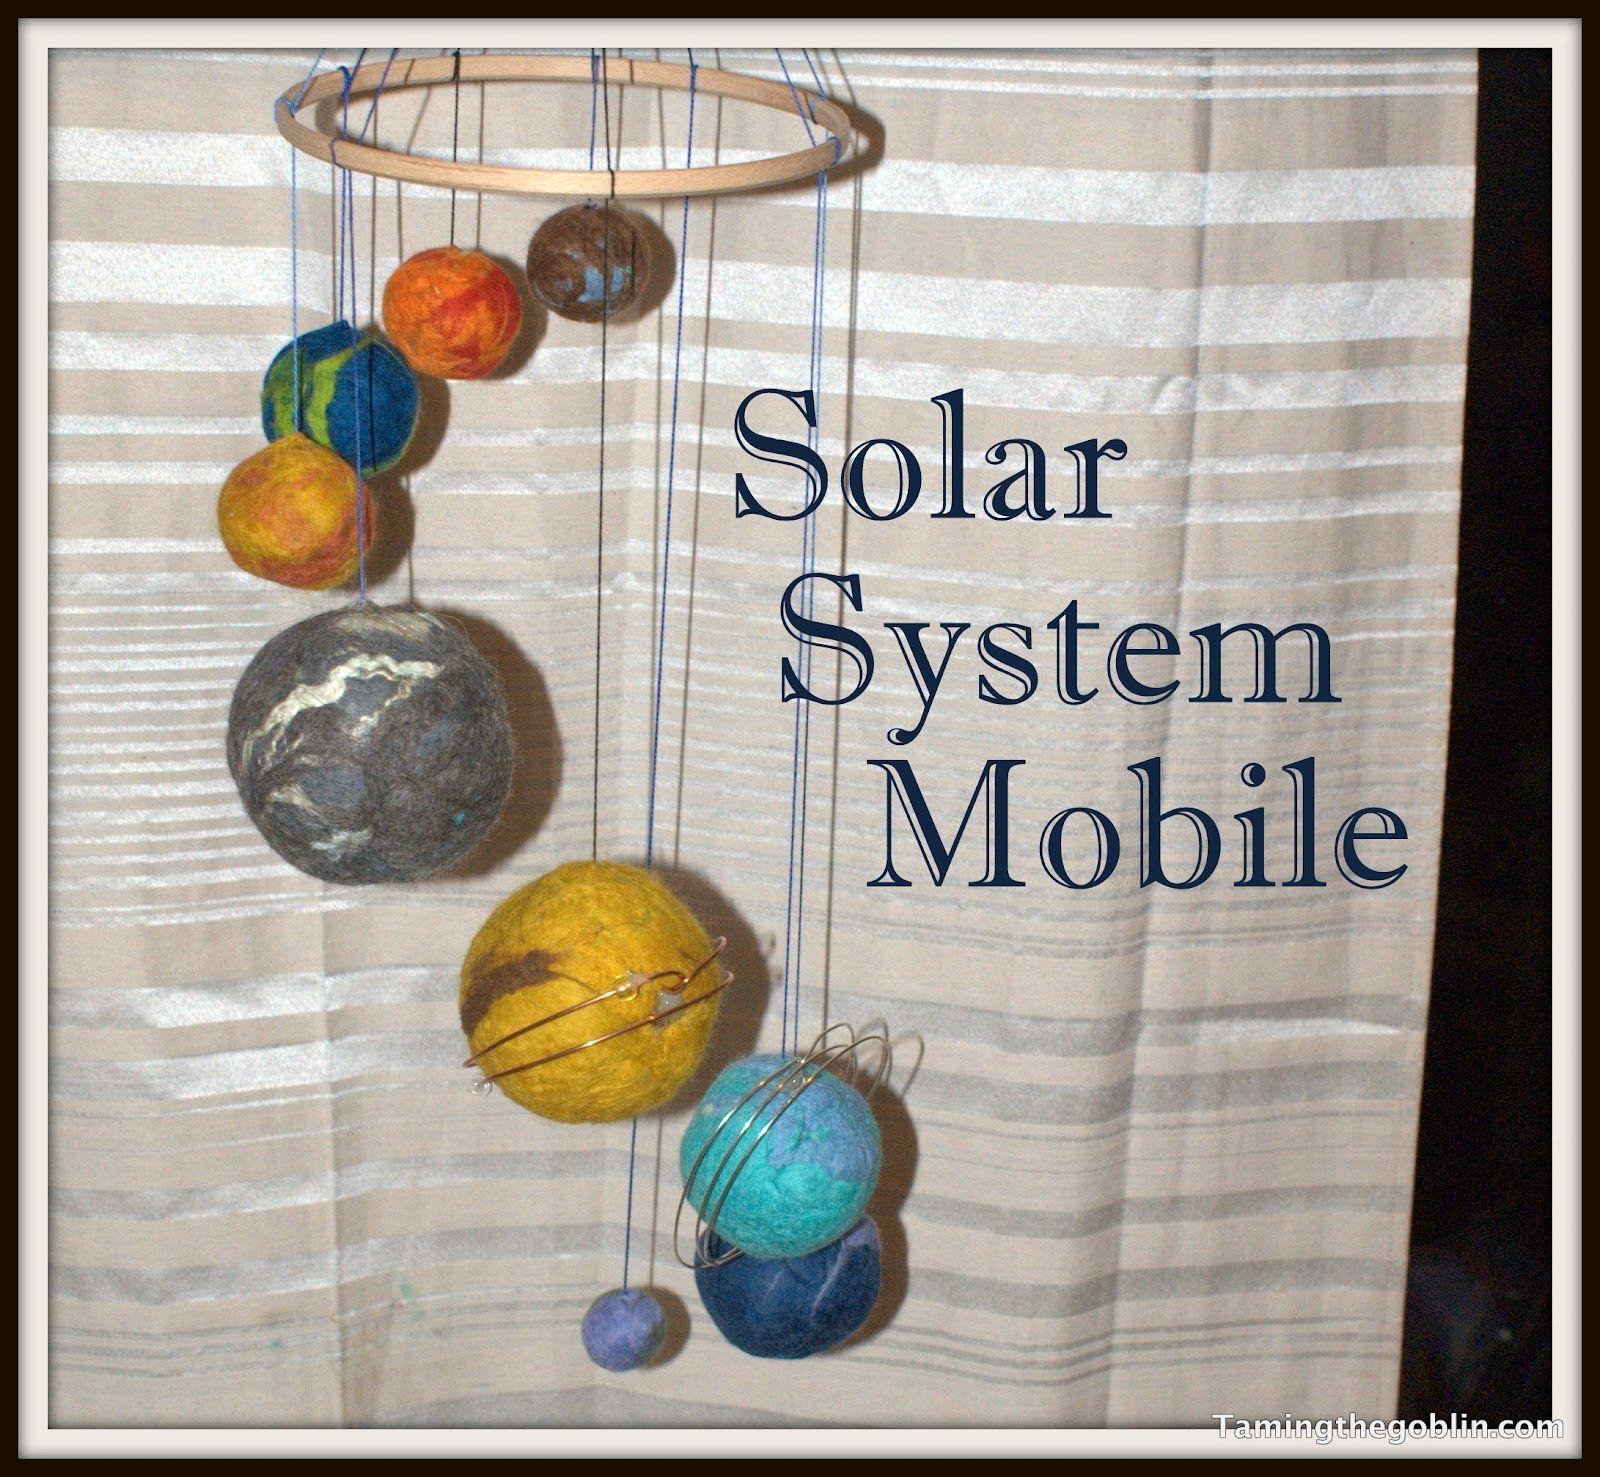 Solar System Mobile, Solar System